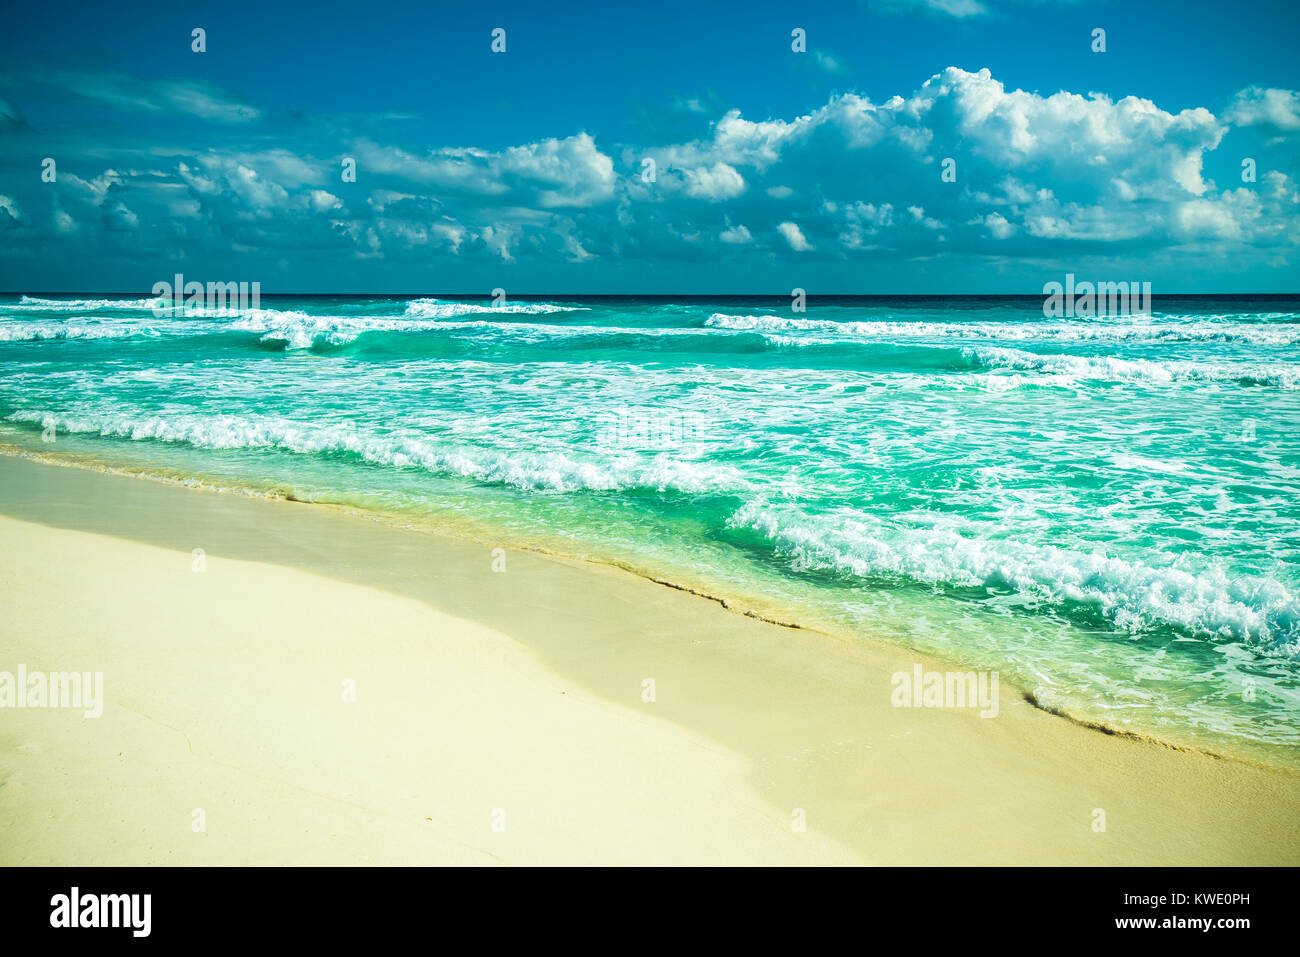 Panorámica de la playa de Cancún, México Imagen De Stock